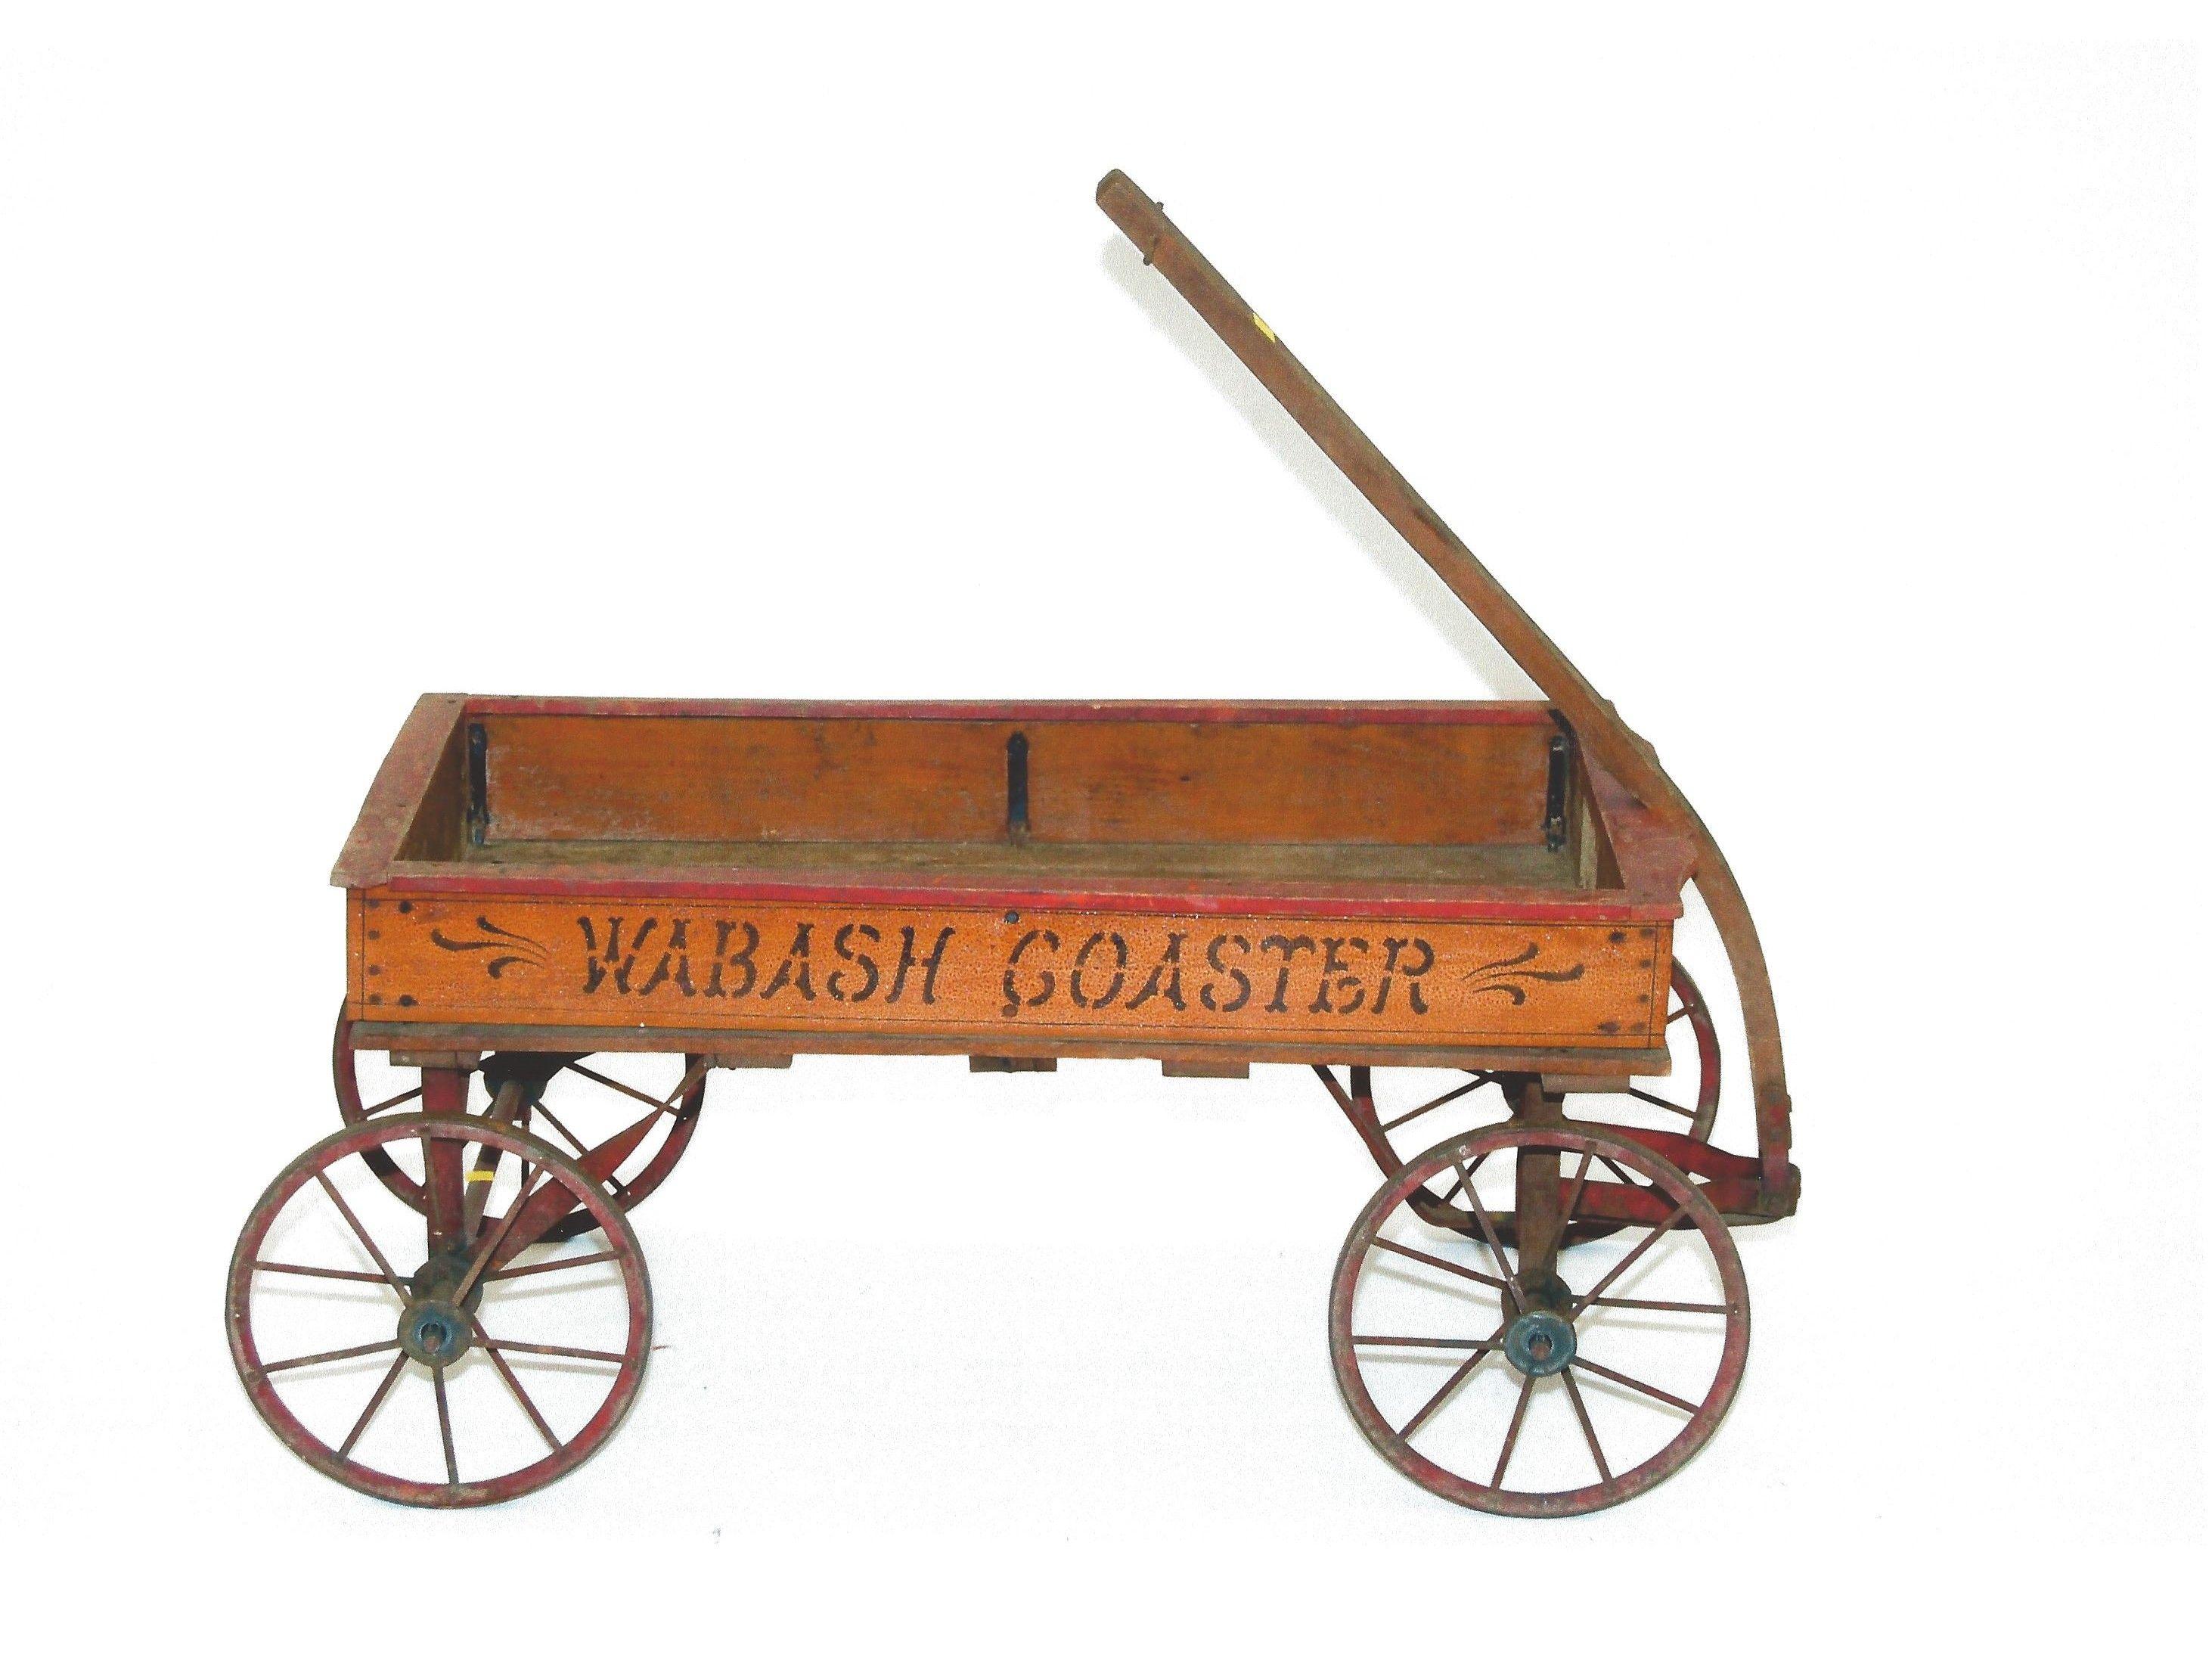 Claasic vintage toys vintage toys second shout out http www - 1906 Wabash Coaster Wagon Wabash Mfg Co Wagon Wheelsantique Metalcredittoy Wagonvintage Toyspedal